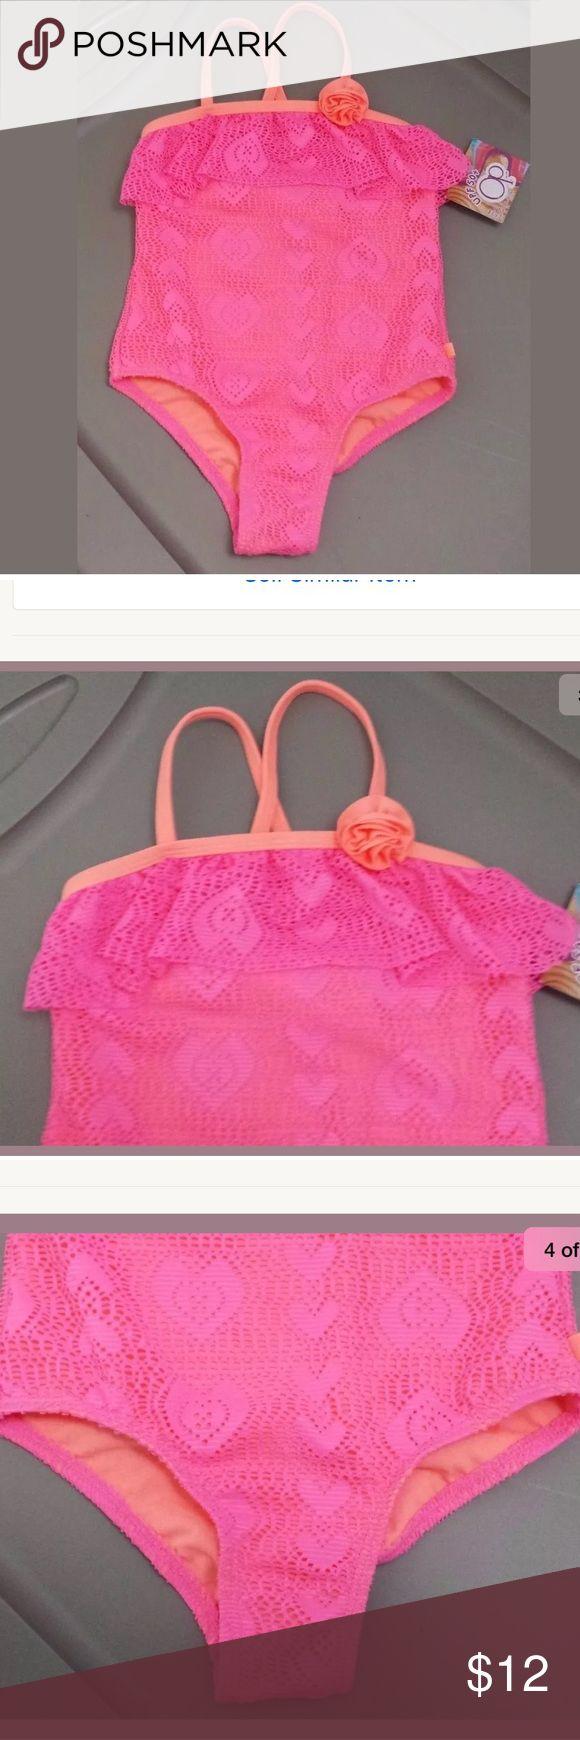 OP baby girls swimsuit size 3T pink NEW UPF 50+ OP baby girls swimsuit size 3T pink NEW UPF 50+                        Smoke and pets free home OP Swim One Piece